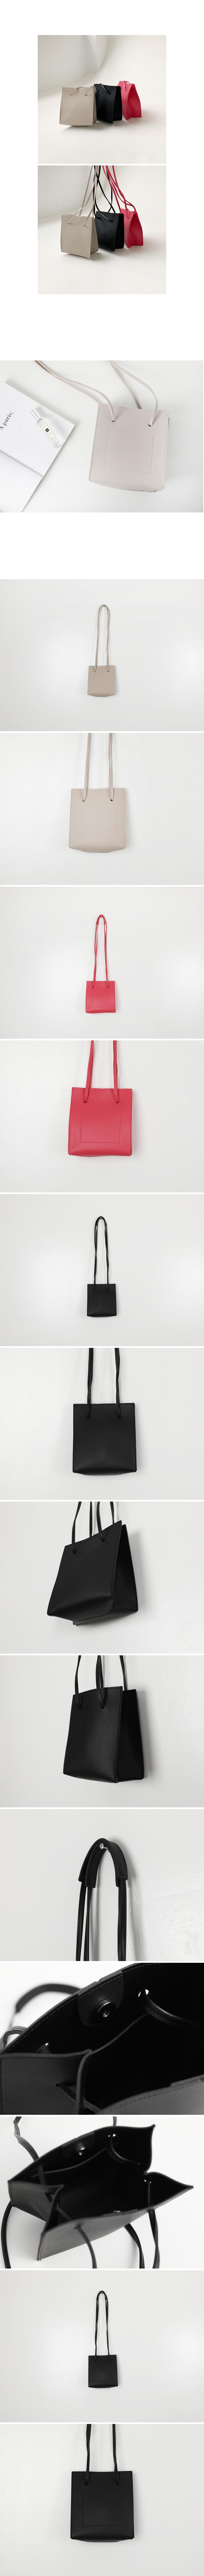 Roy DiSquare Cross Bag